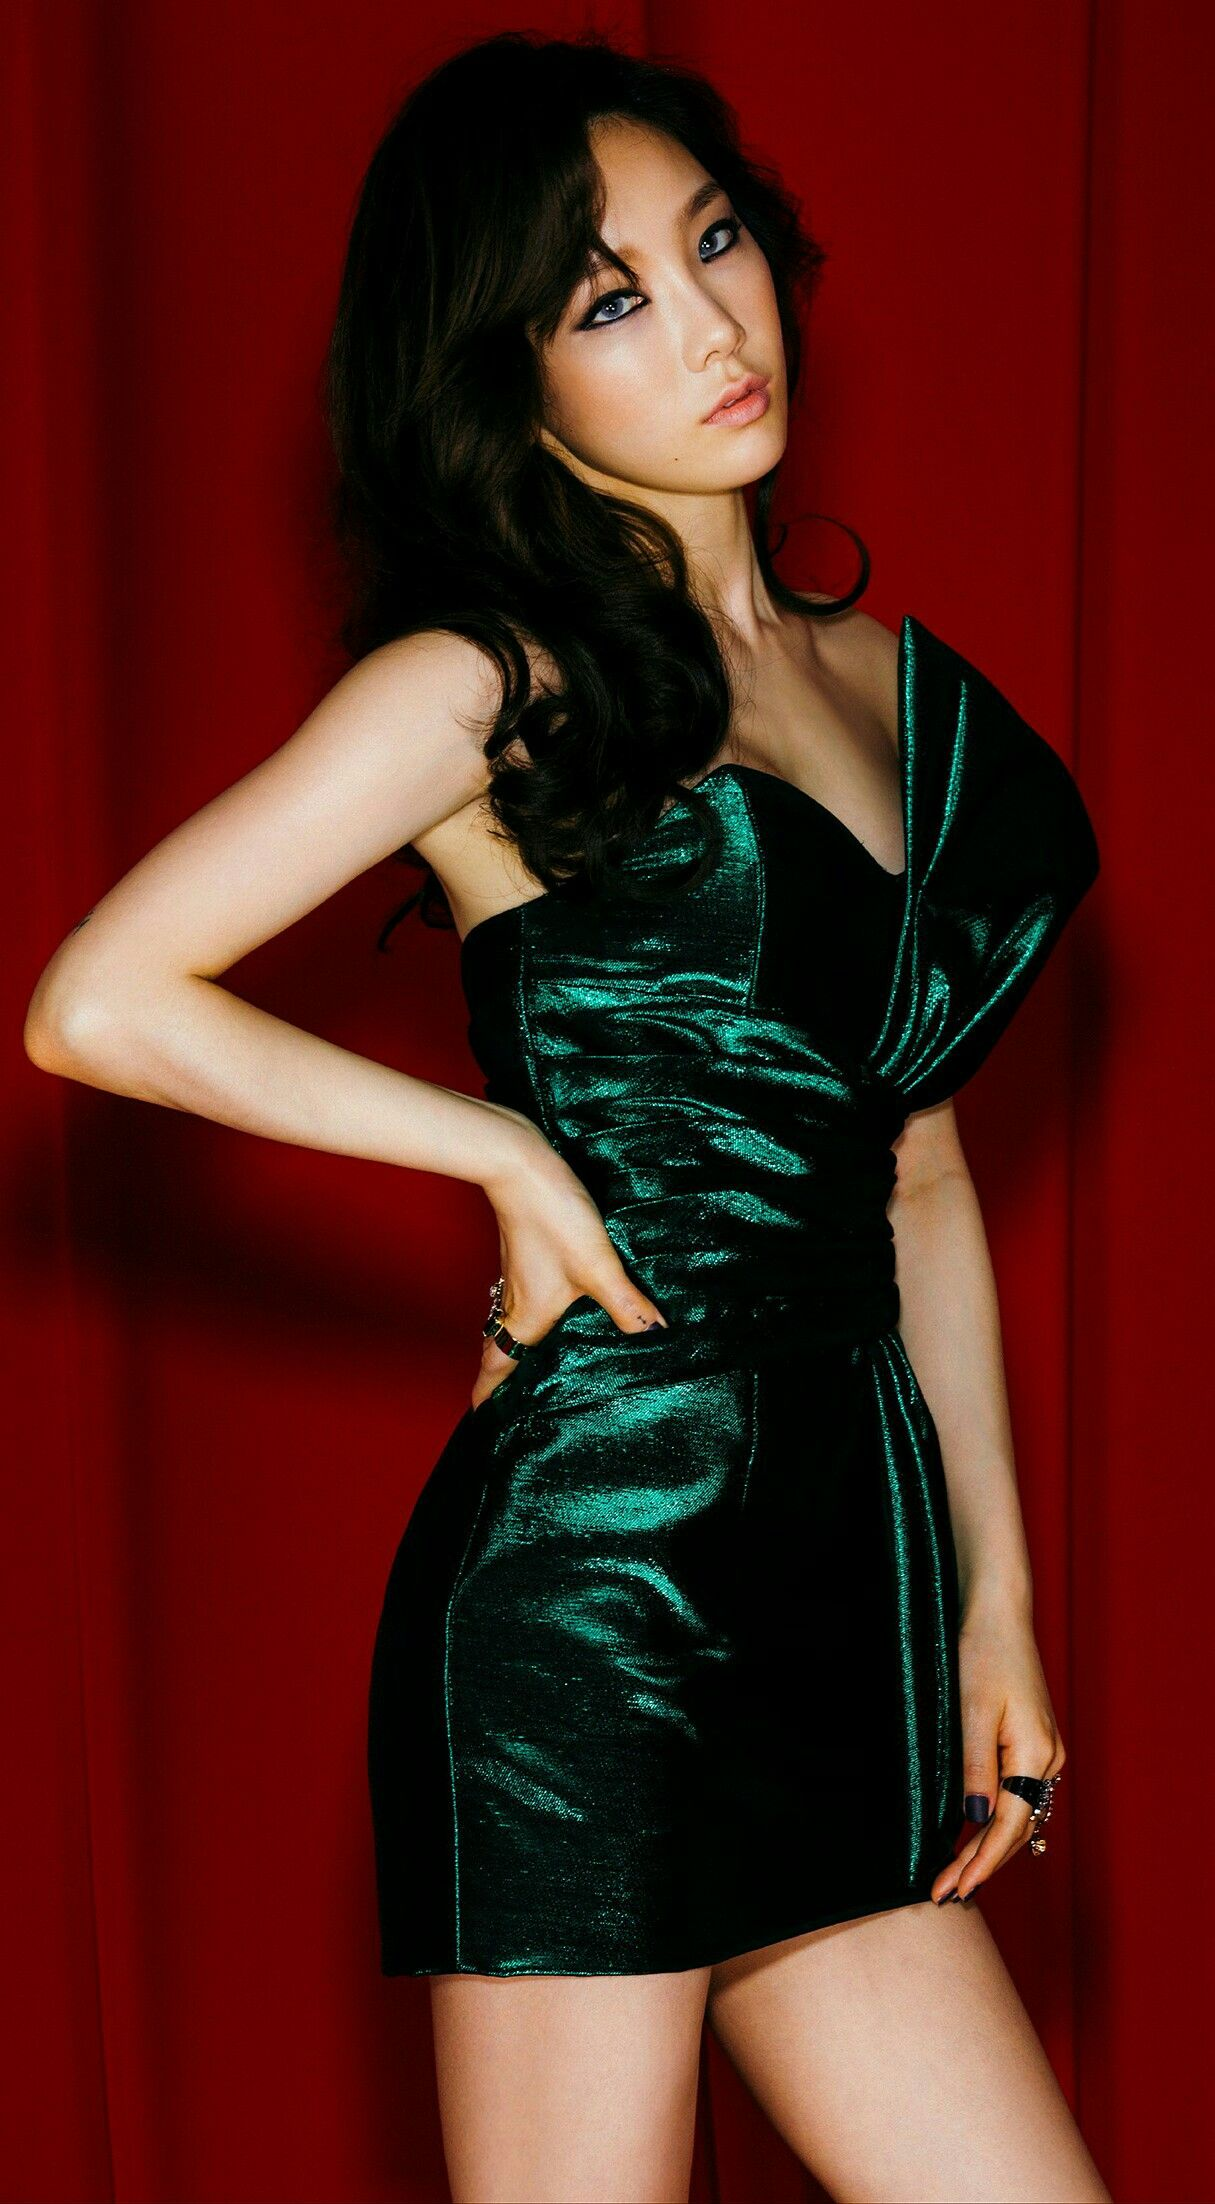 Kim Tae Yeon - SNSD Leader (Taeyeon)   Taeyeon, Girls